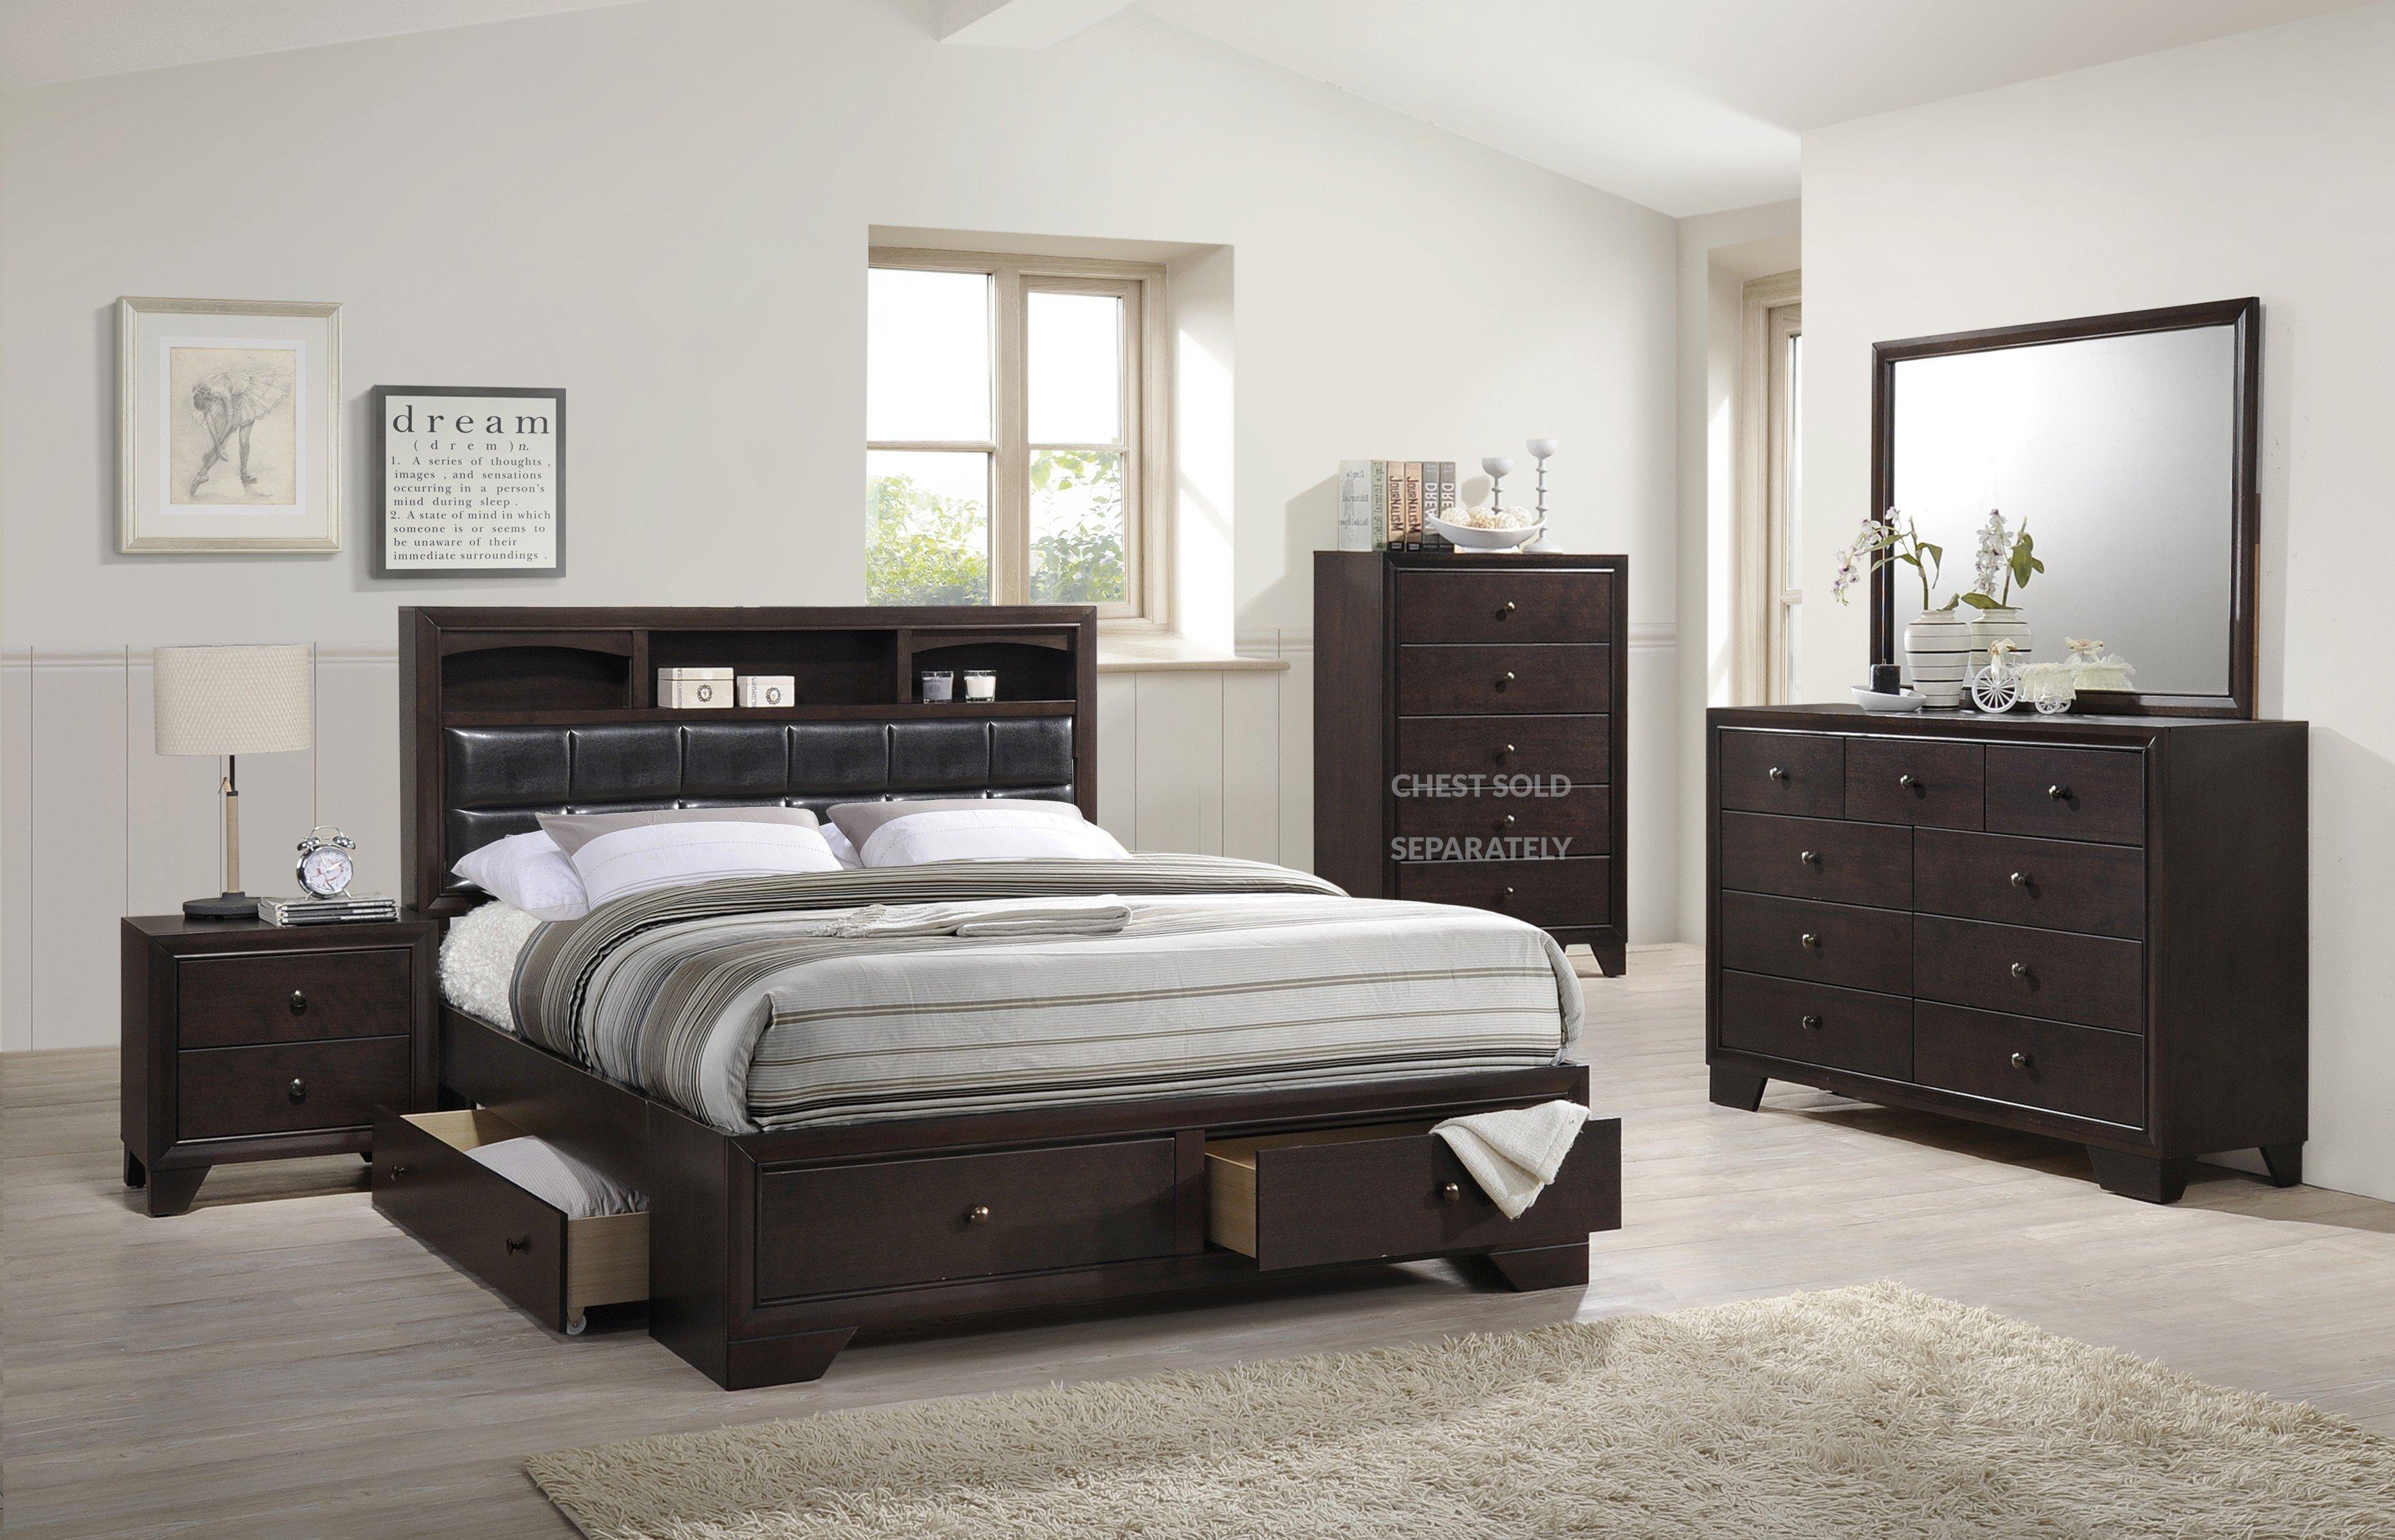 Bob Discount Furniture Bedroom Set Best Of Bedroom Breathtaking Bedroom Sets with Mattress for Best